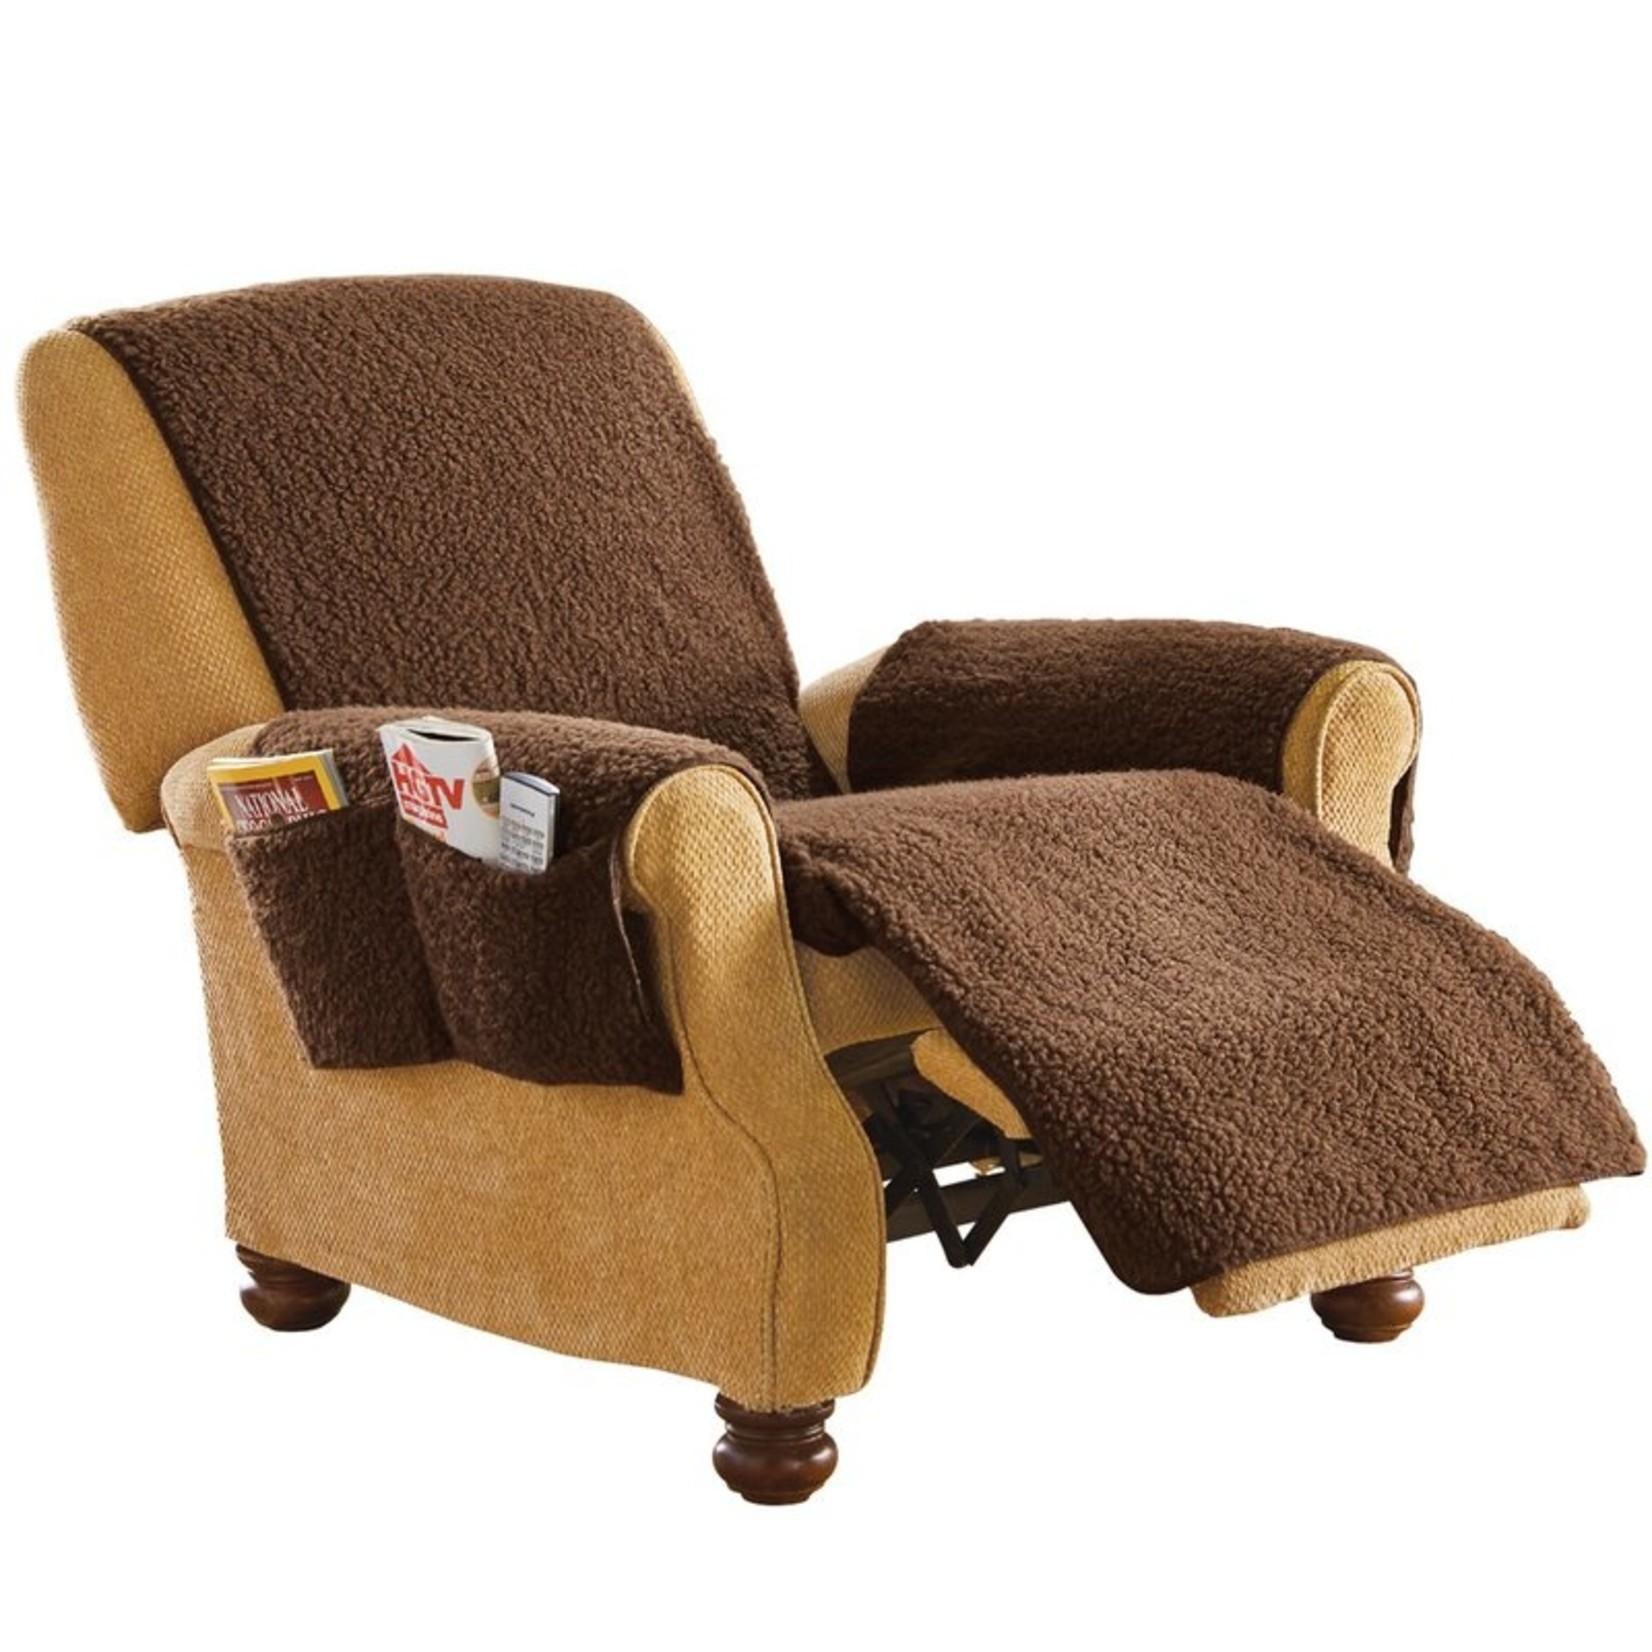 *Box Cushion Recliner Slipcover - Brown